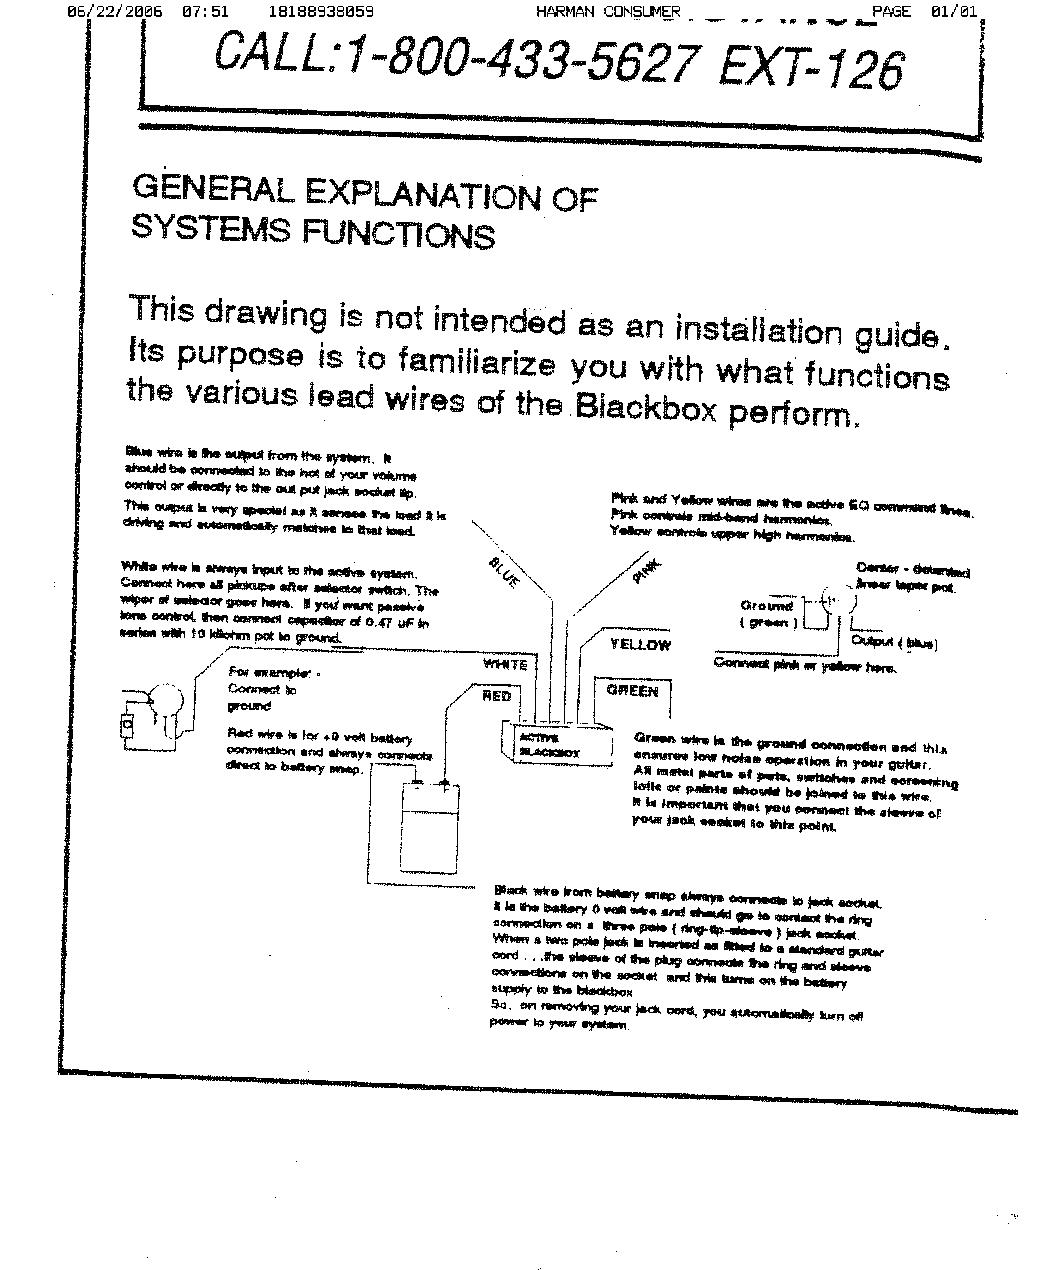 Jackson Pickup Wiring Diagram - Circuit Diagram Symbols •